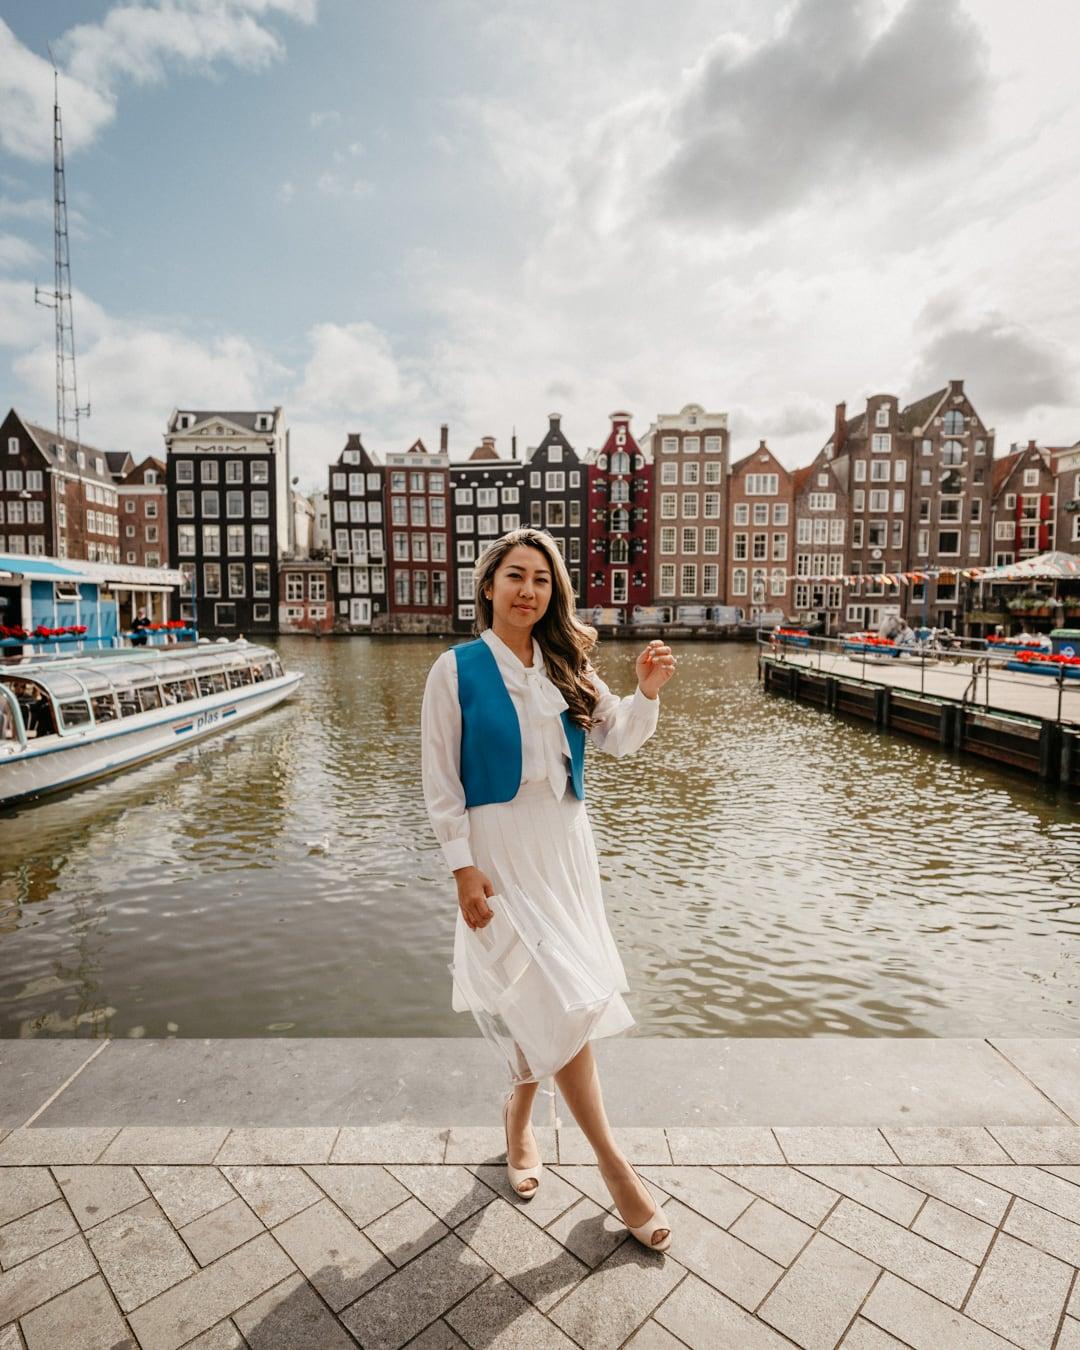 Instagram Amsterdam photo taken at Damrak in Dam Square